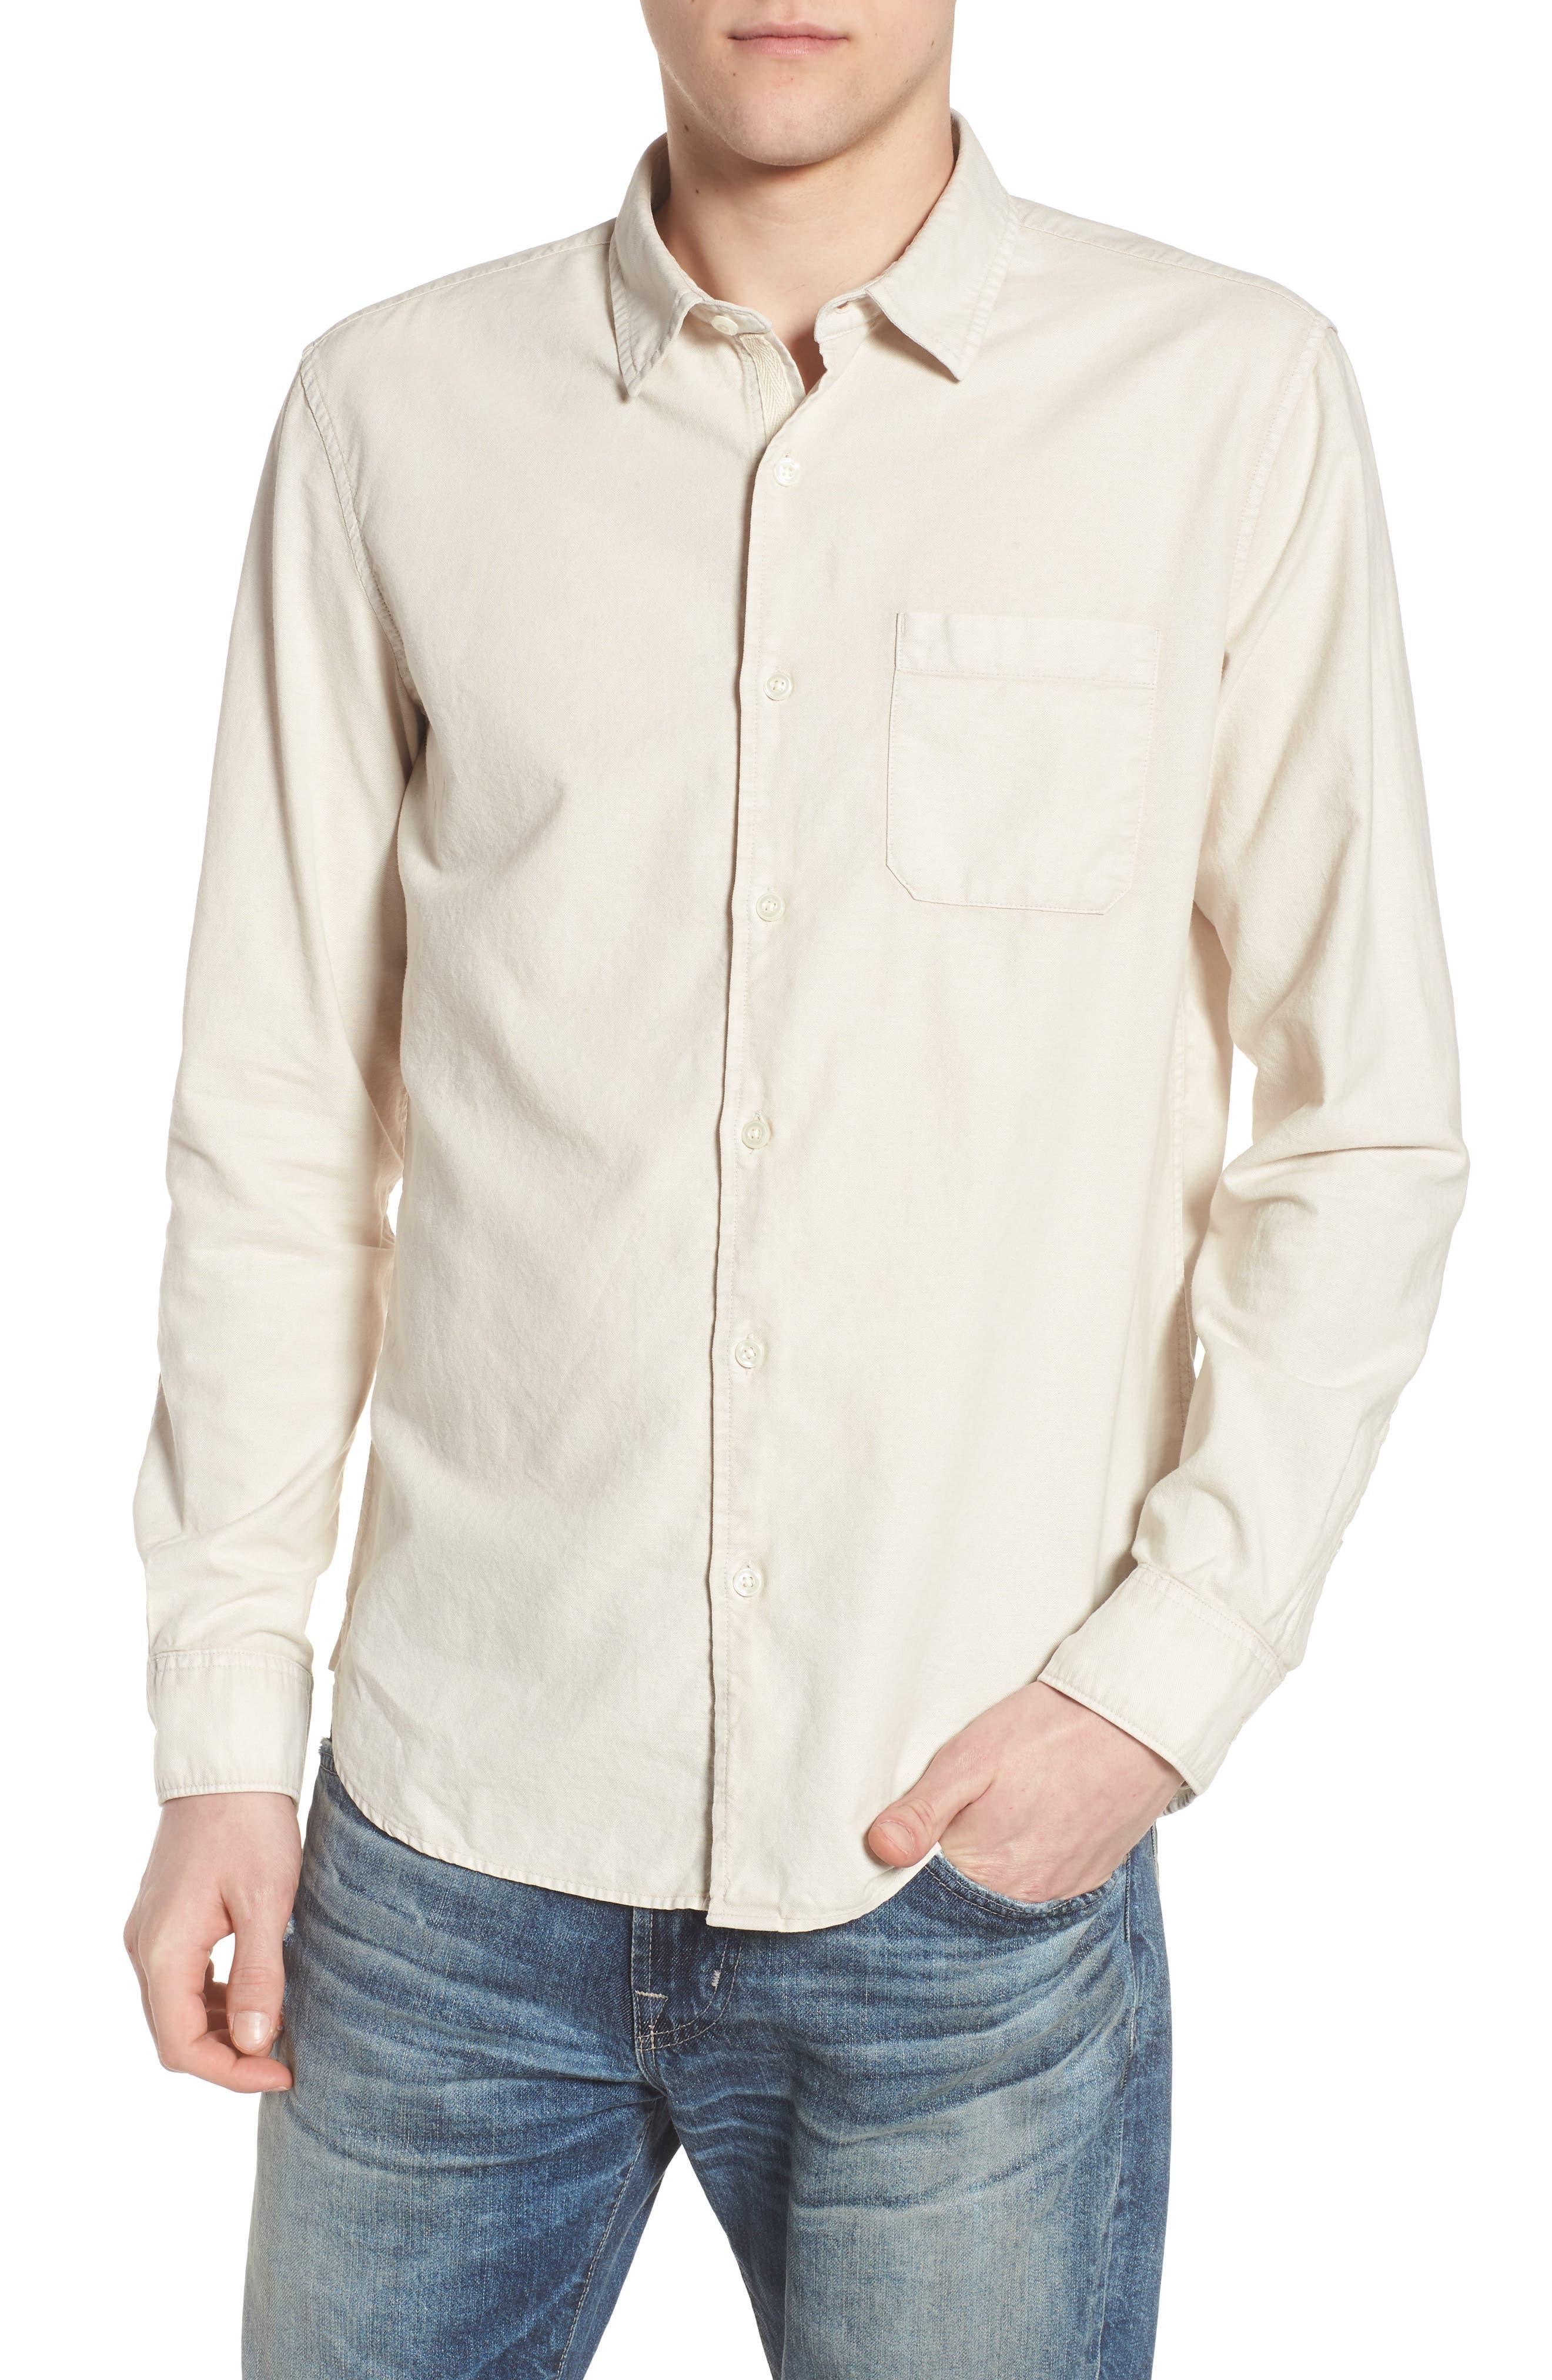 Bristol Slim Fit Sport Shirt,                             Main thumbnail 1, color,                             Sunbaked Mineral Veil